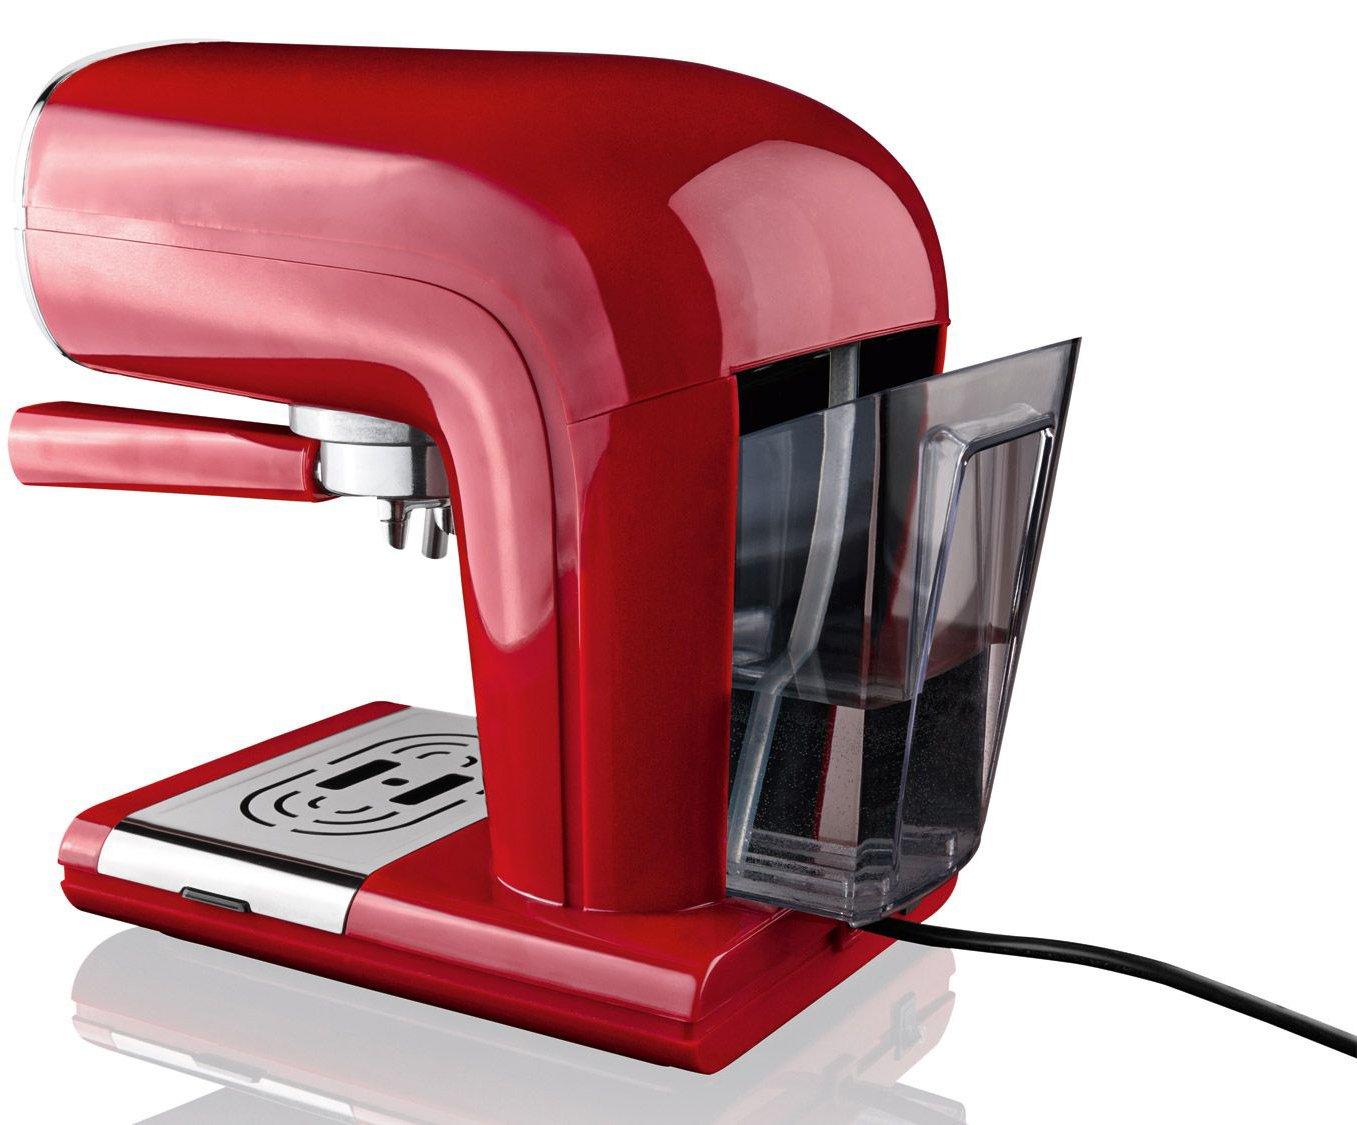 Silvercrest® Cafetera expreso semr 850 A1 rojo: Amazon.es: Hogar